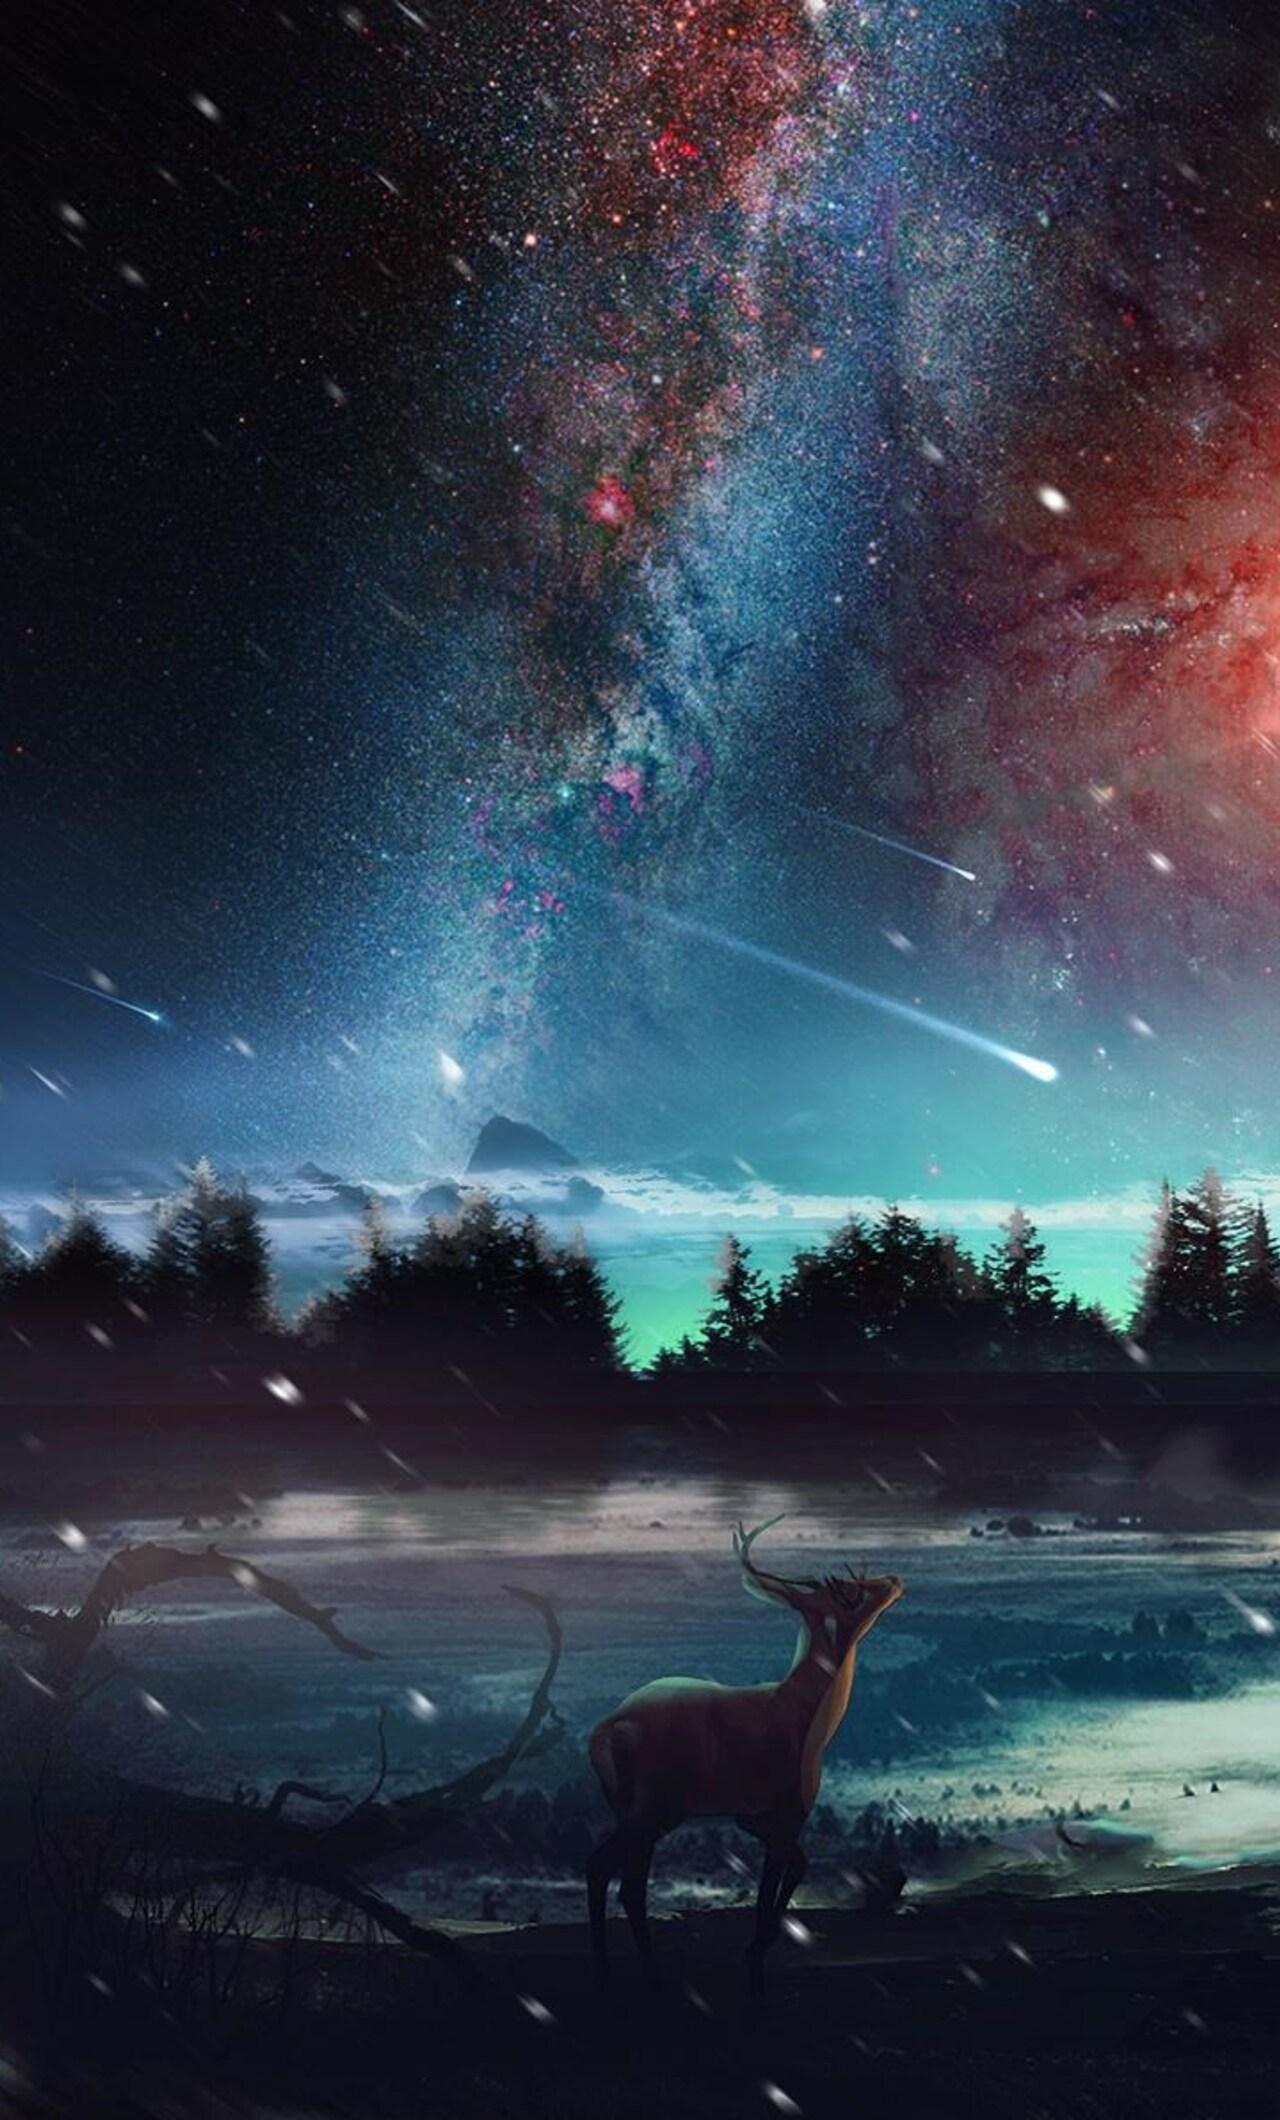 universe-scenery.jpg